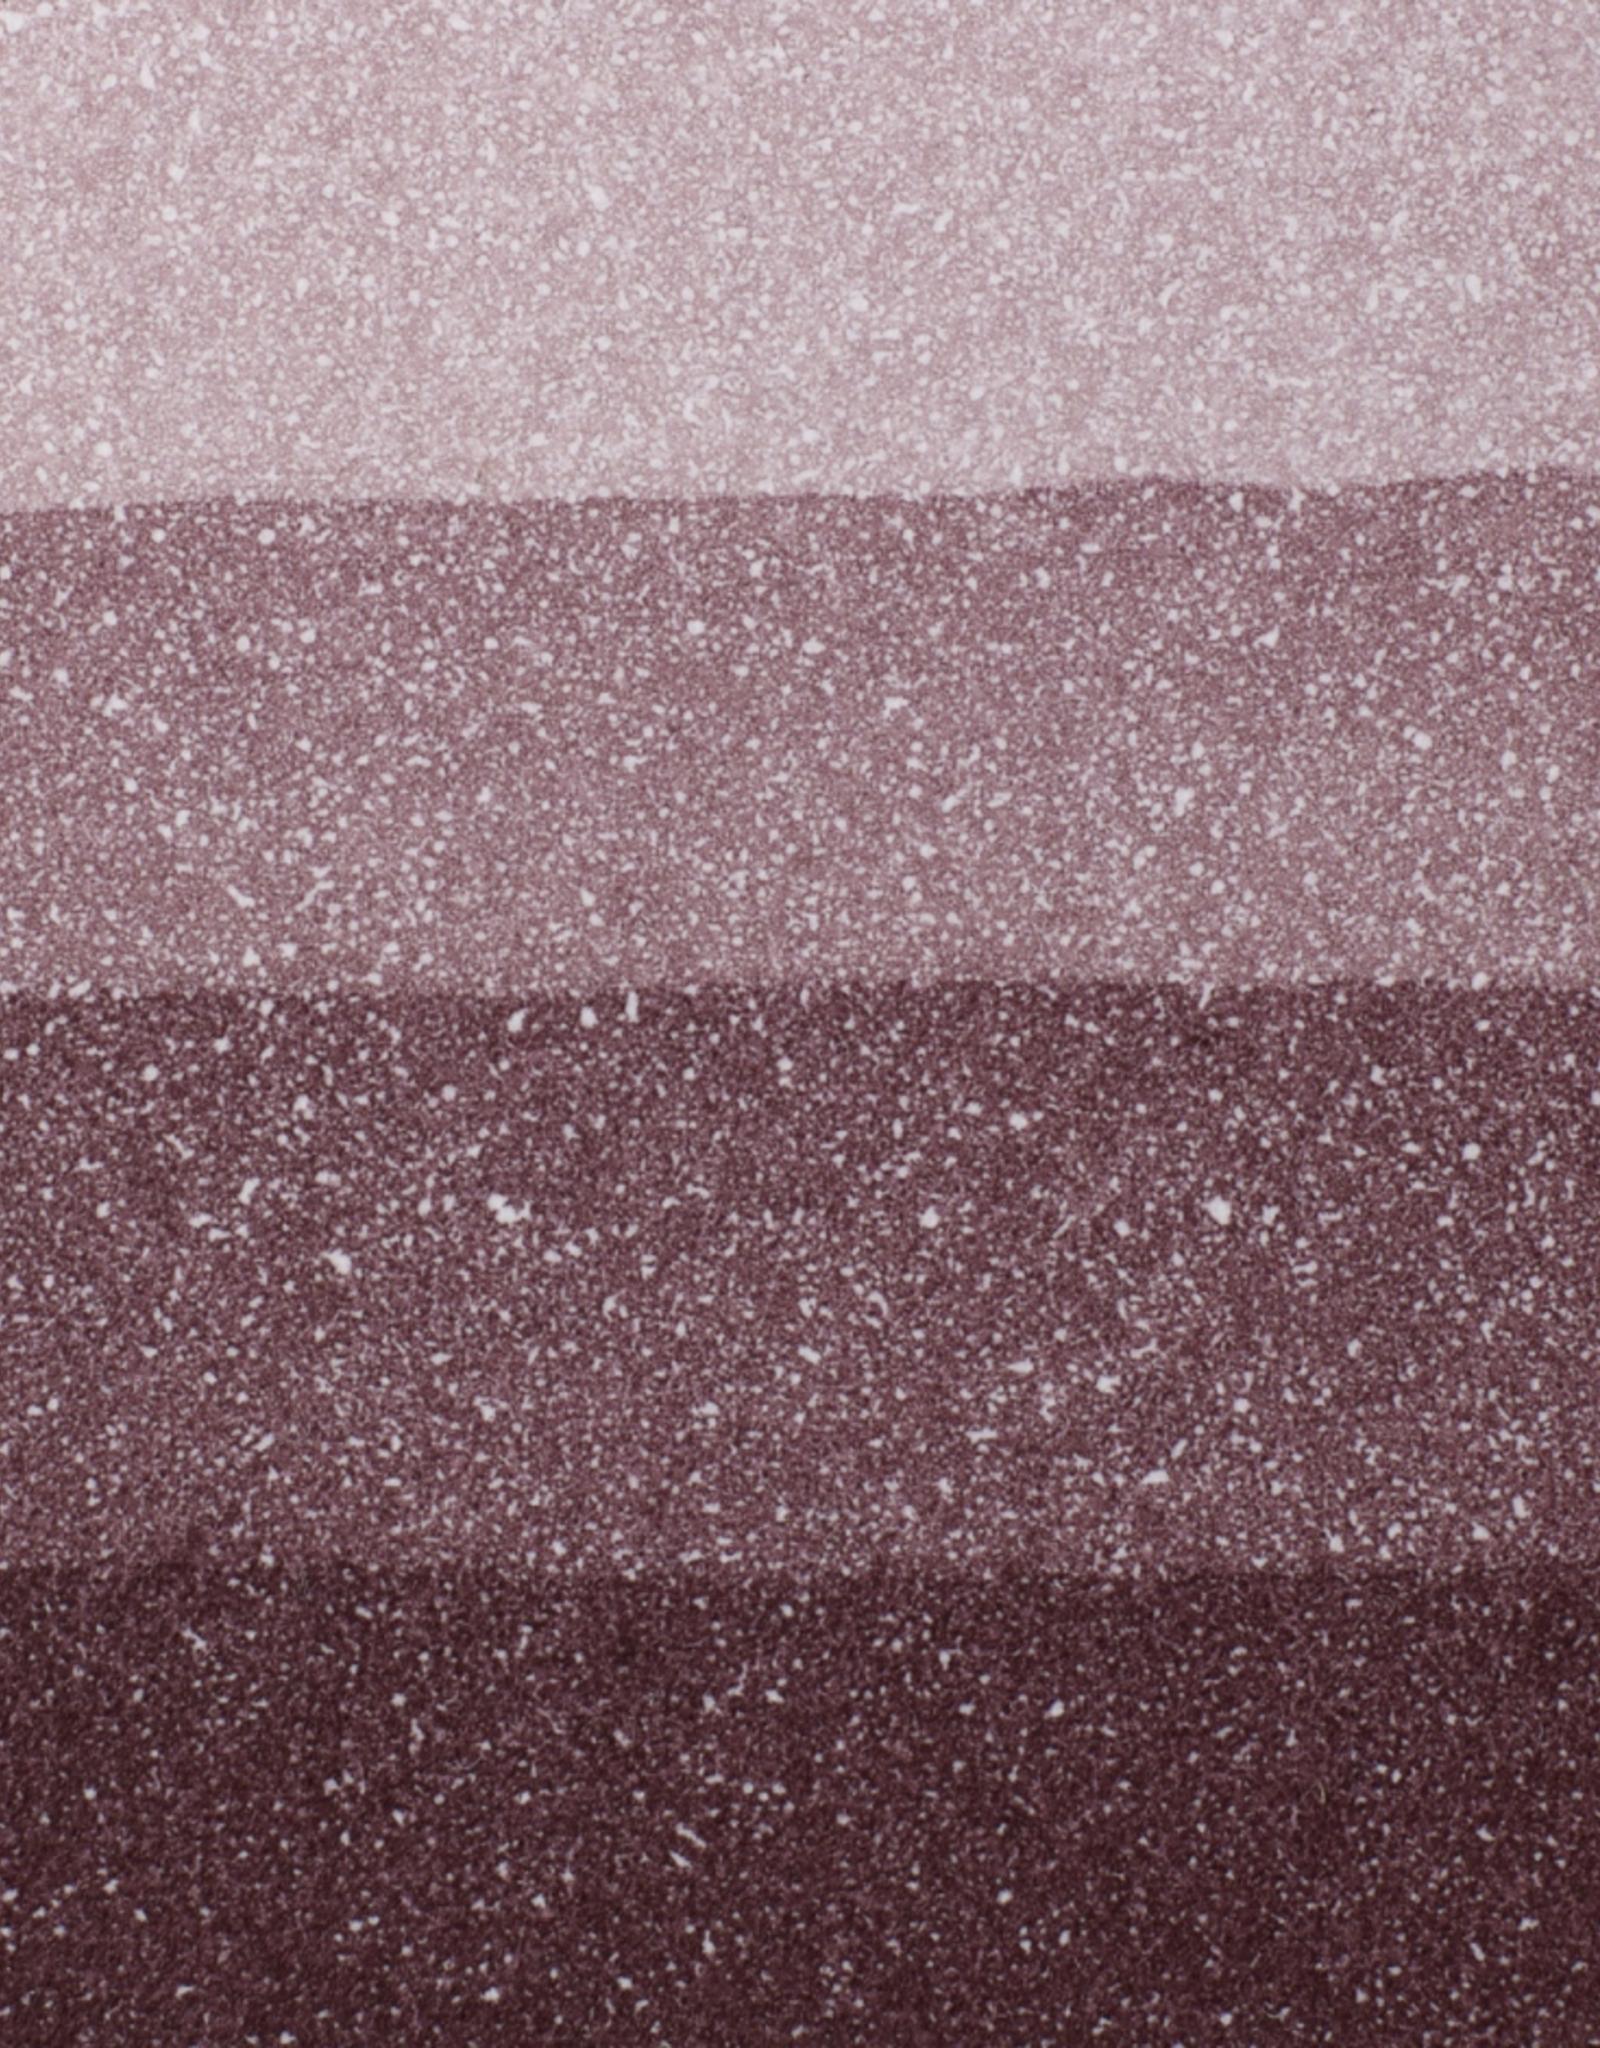 Charbonnel, Etching Ink, Van Dyck Brown, Series 3, 200ml, Can